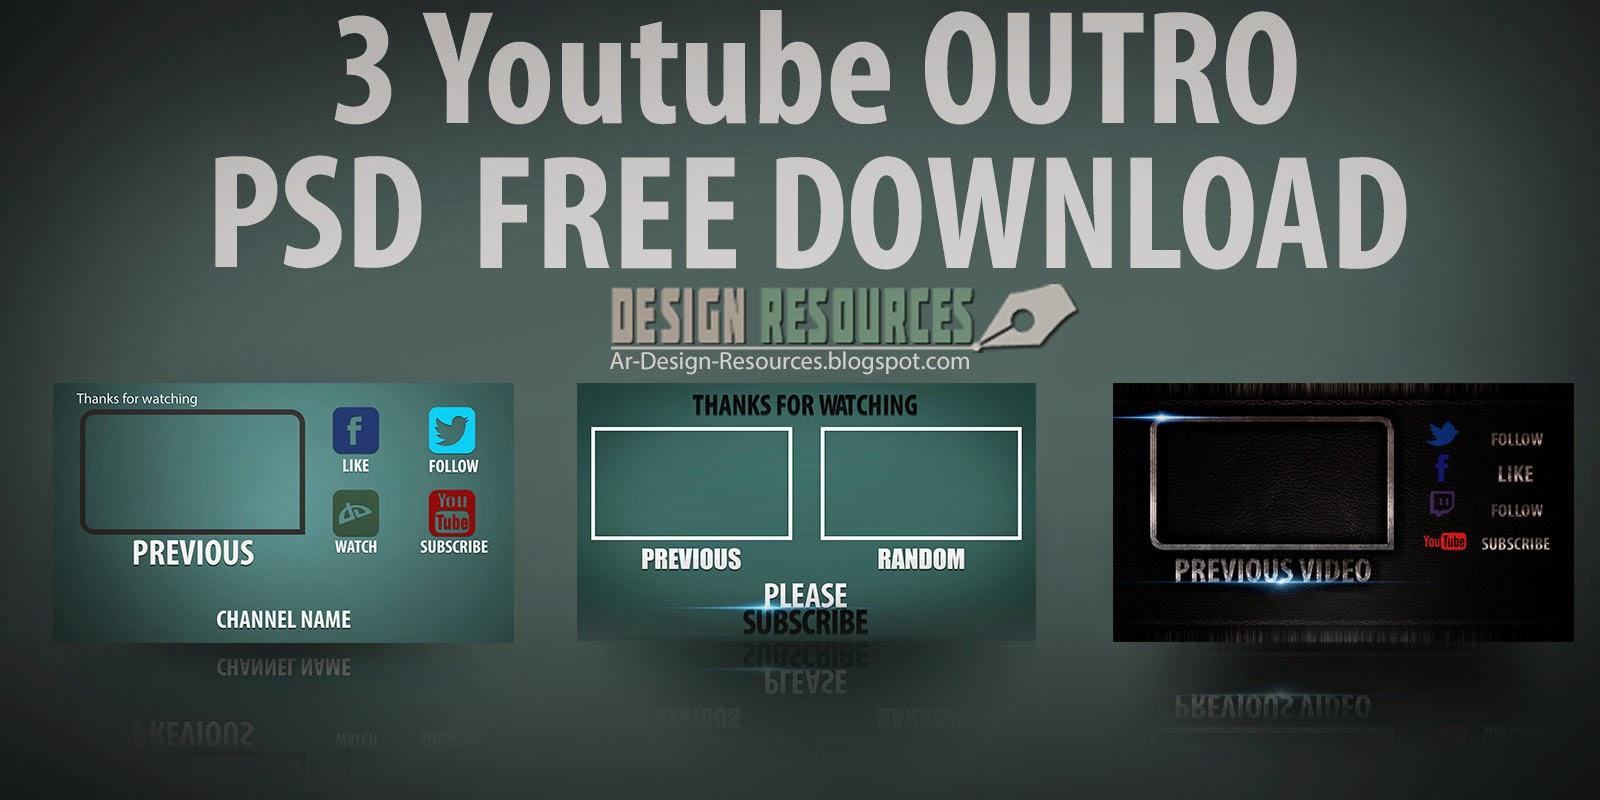 http://2.bp.blogspot.com/-ZLgOaYzN_3Y/VQSXVOkEpKI/AAAAAAAABO0/yG74xai5Wg8/s1600/ADR_3%2BYoutube%2BOutro%2Bthumbnail.jpg